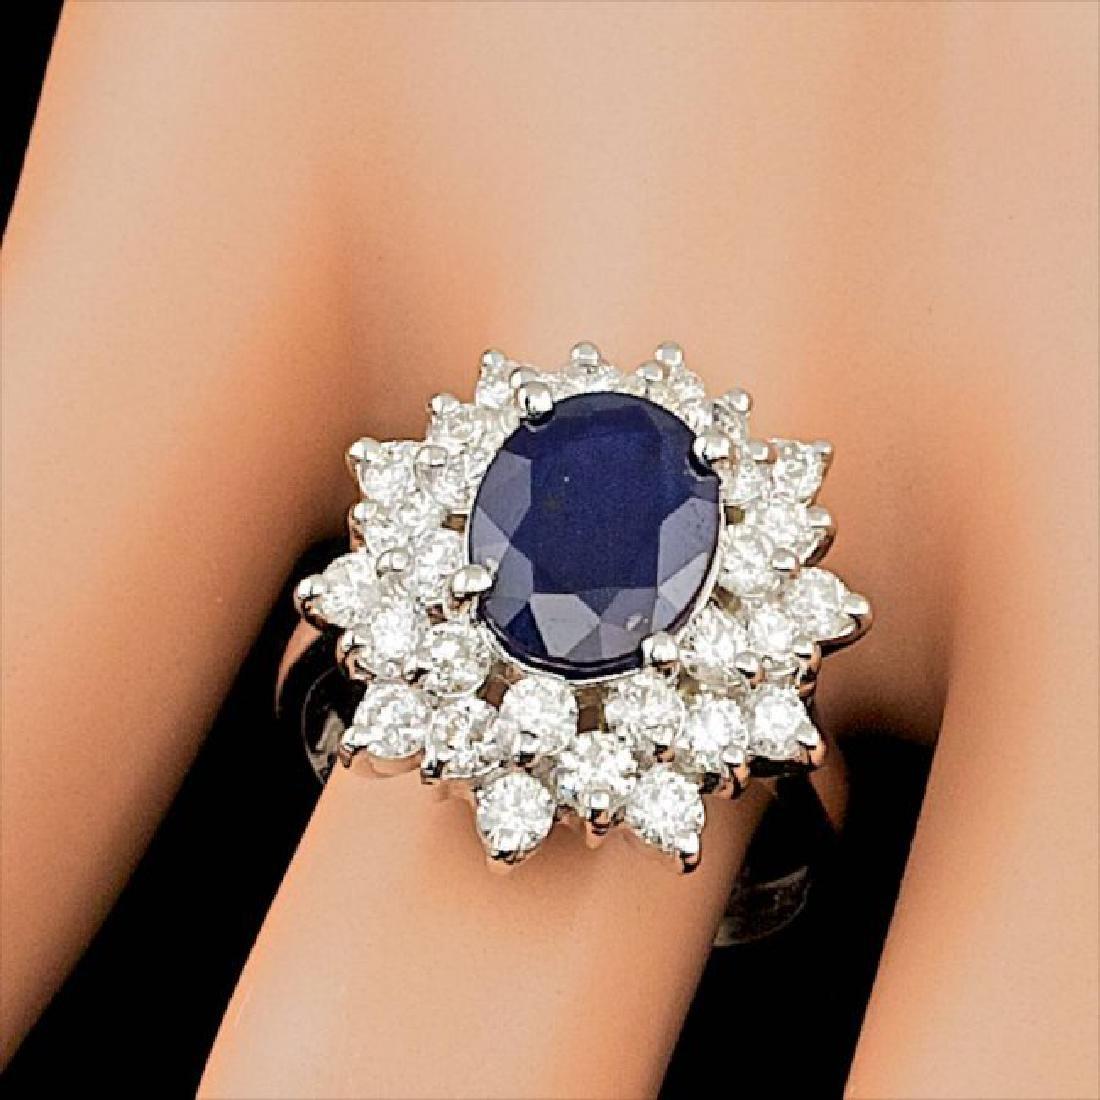 14k Gold 3.30ct Sapphire 1.74ct Diamond Ring - 4